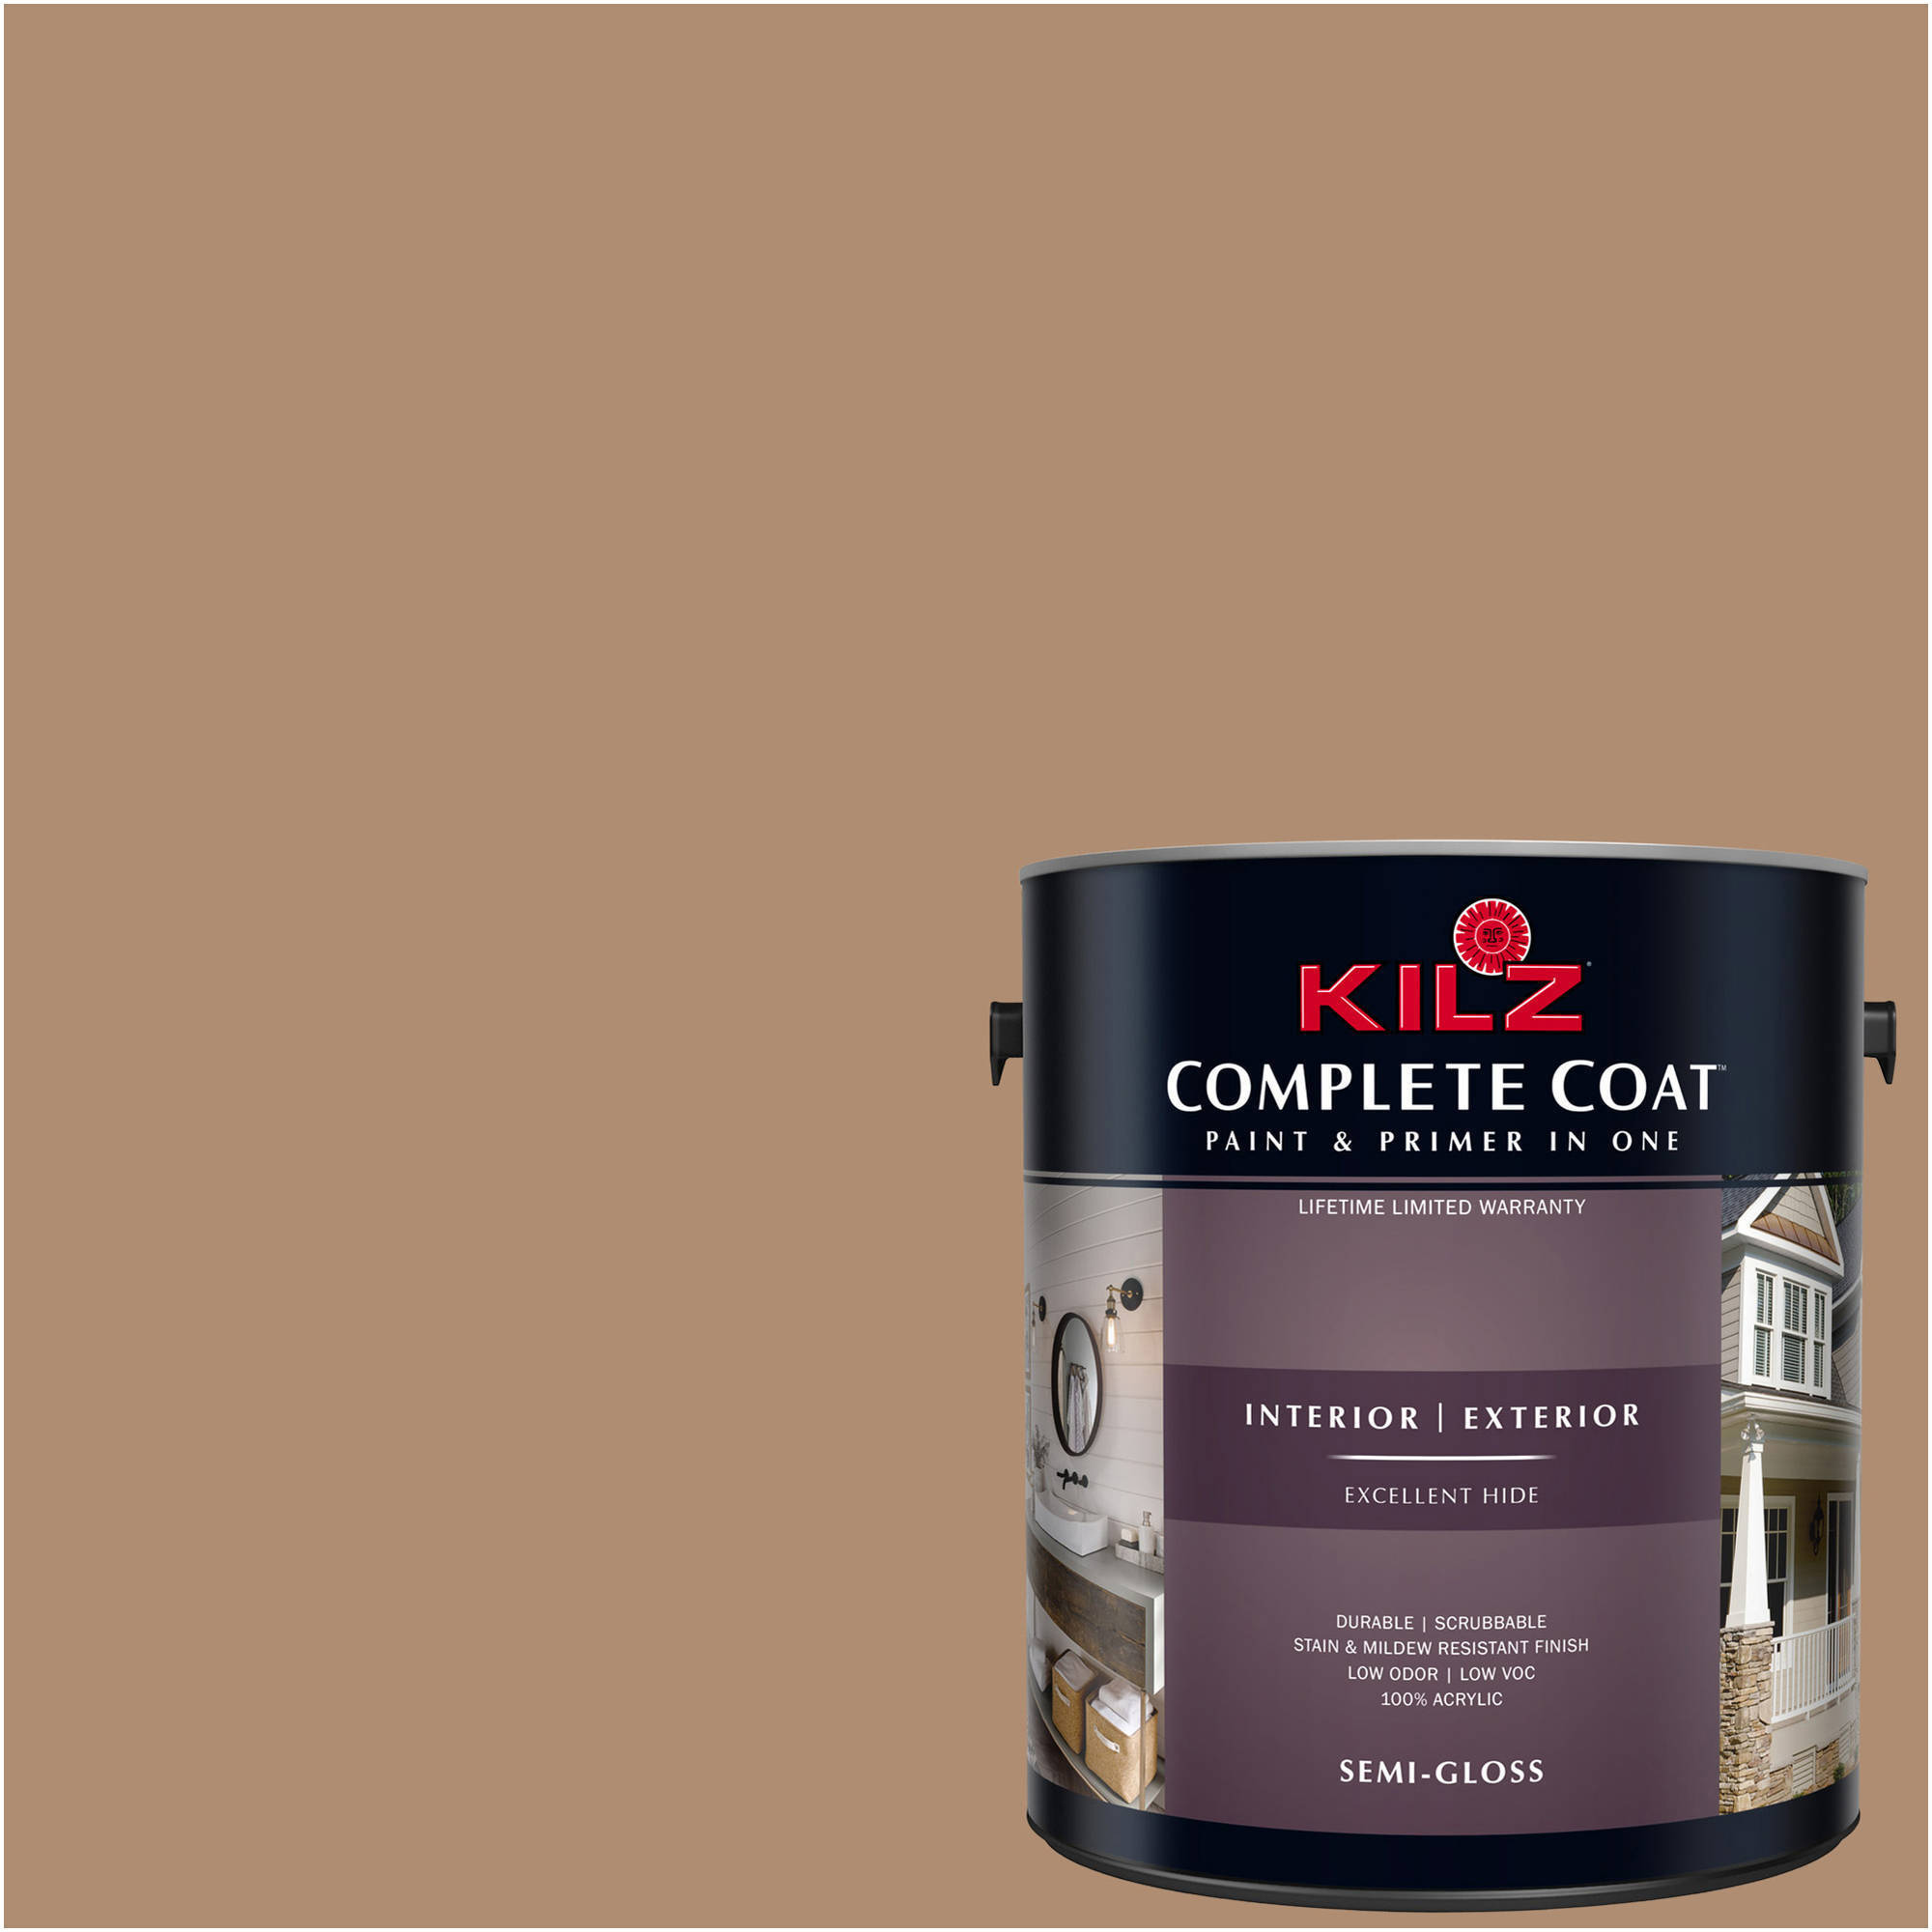 KILZ COMPLETE COAT Interior/Exterior Paint & Primer in One #LC250-02 Caramelized